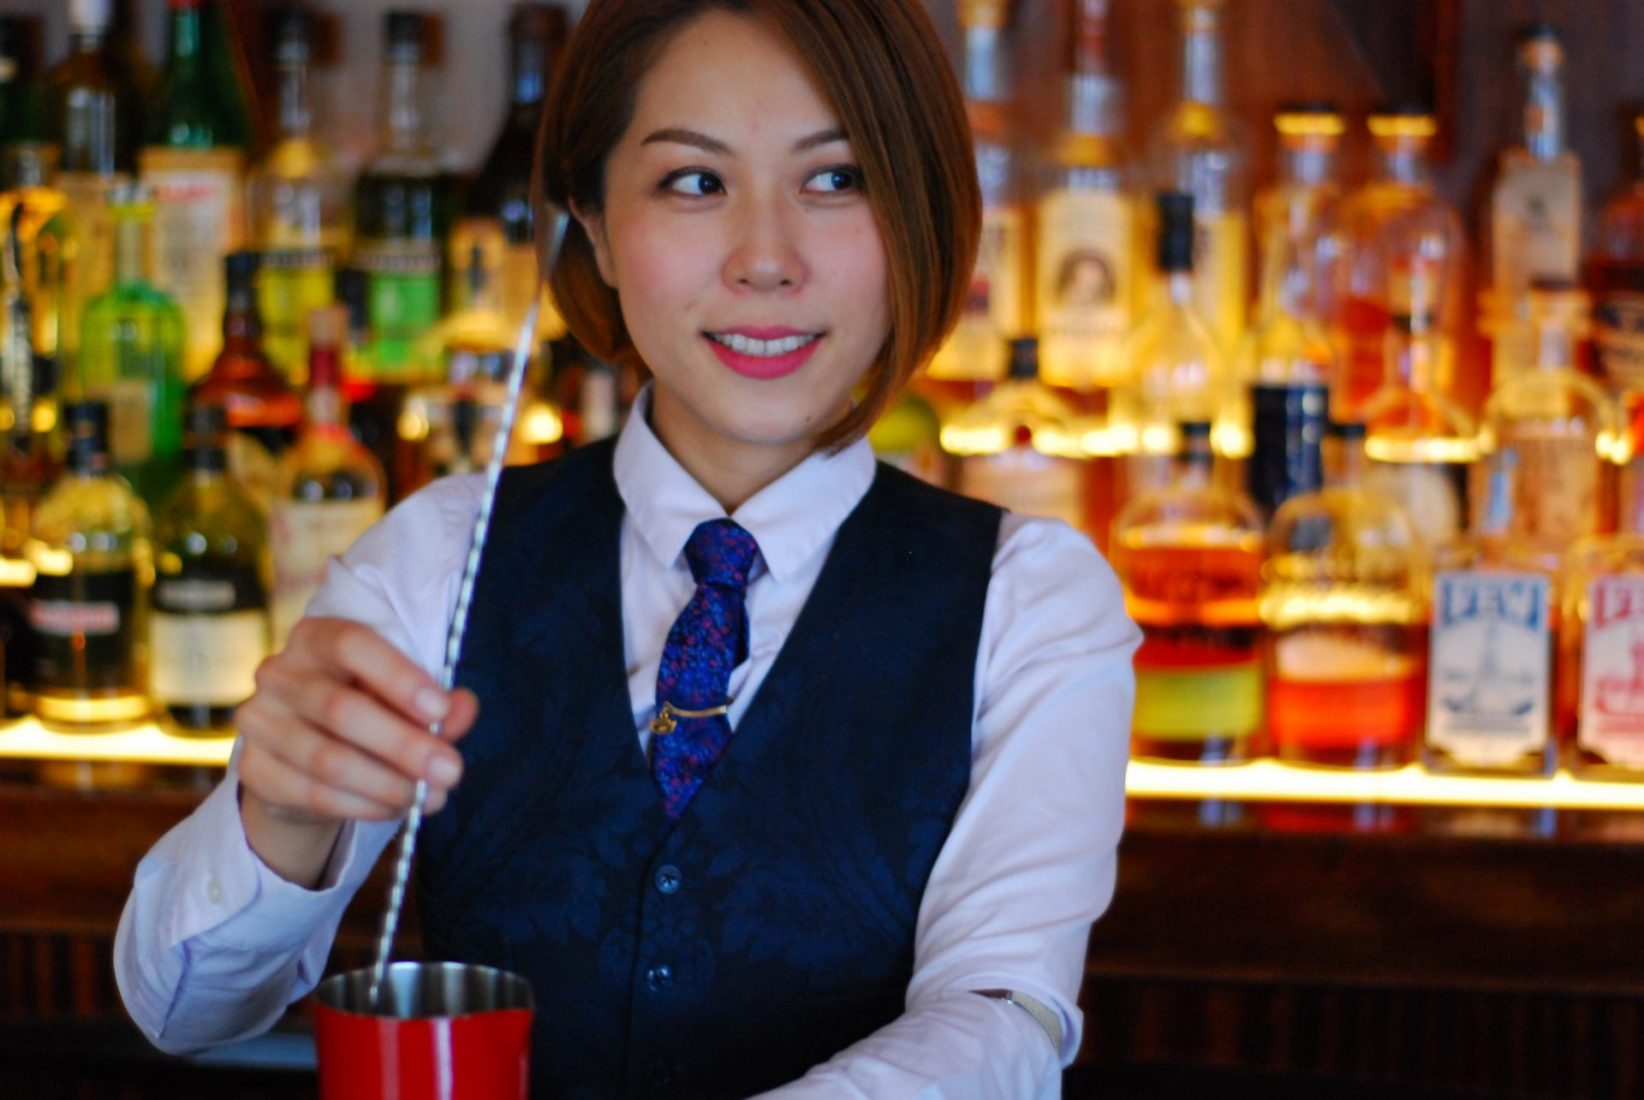 Cocktail Wednesday with Nana Serves Up Mixology Education at Bar Moga